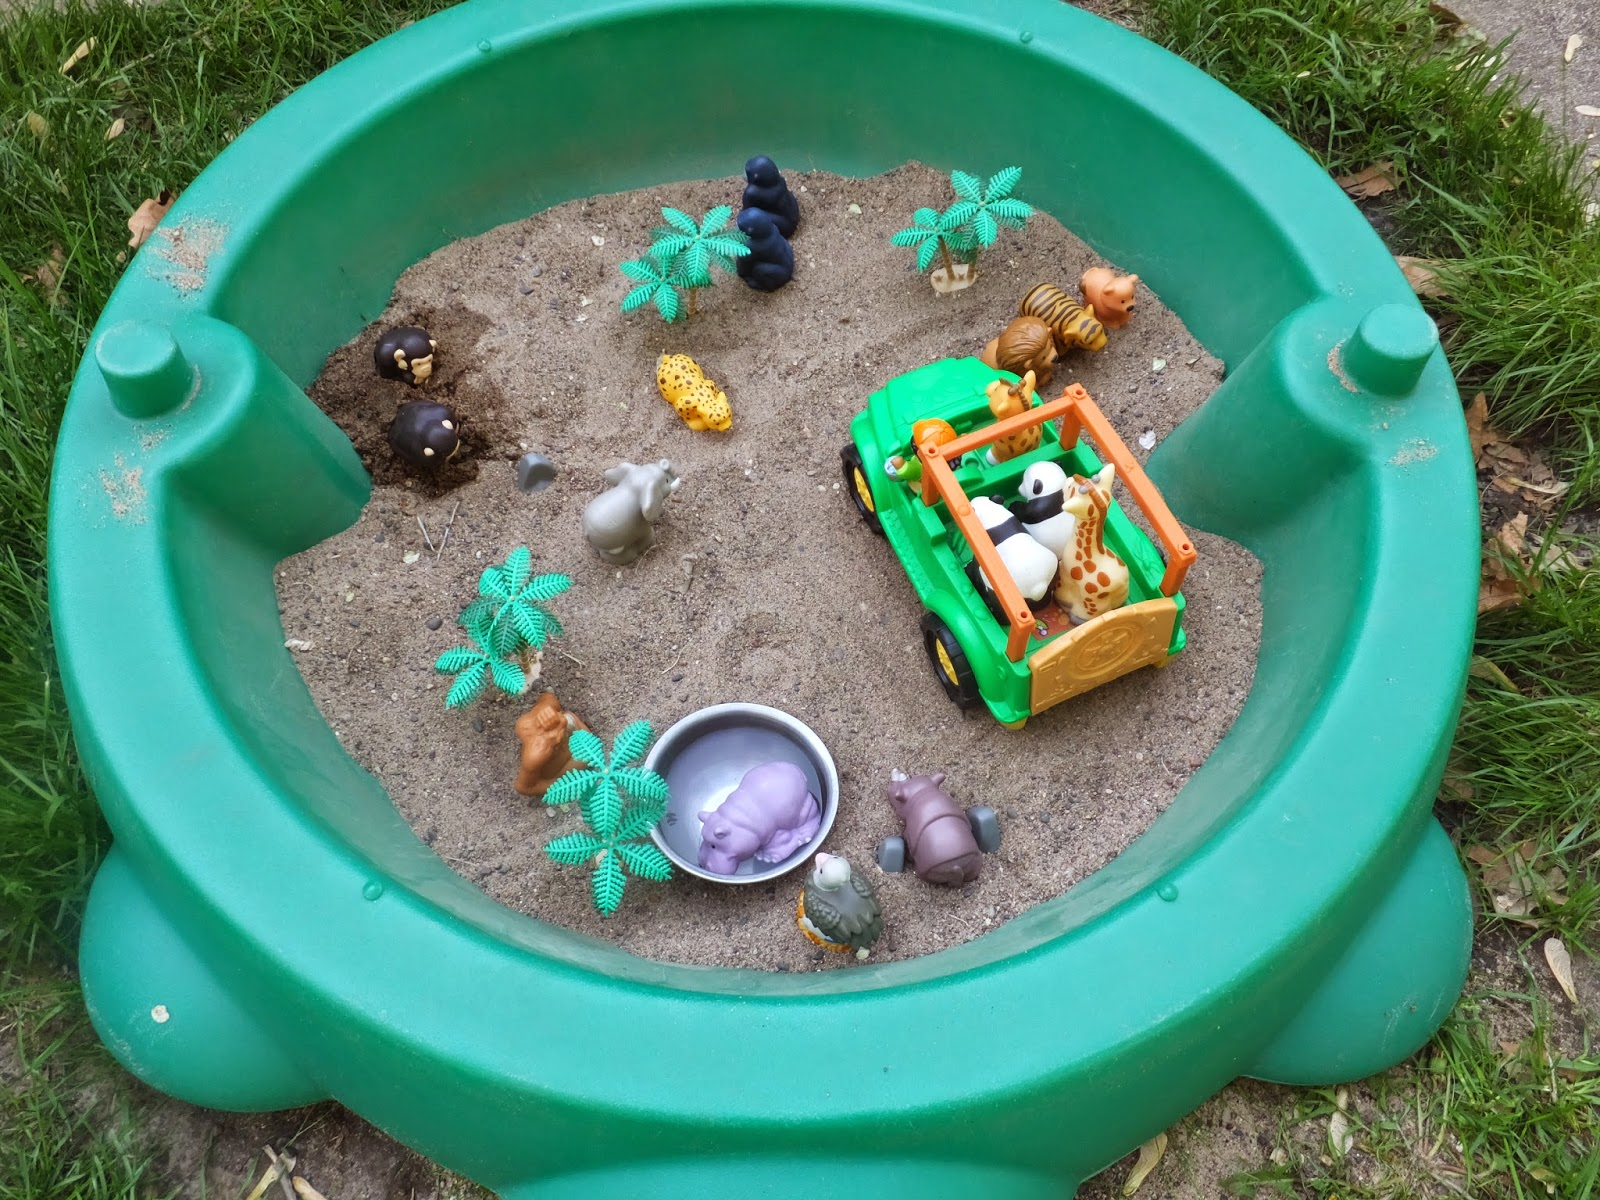 kidspert sensory sandbox safari land